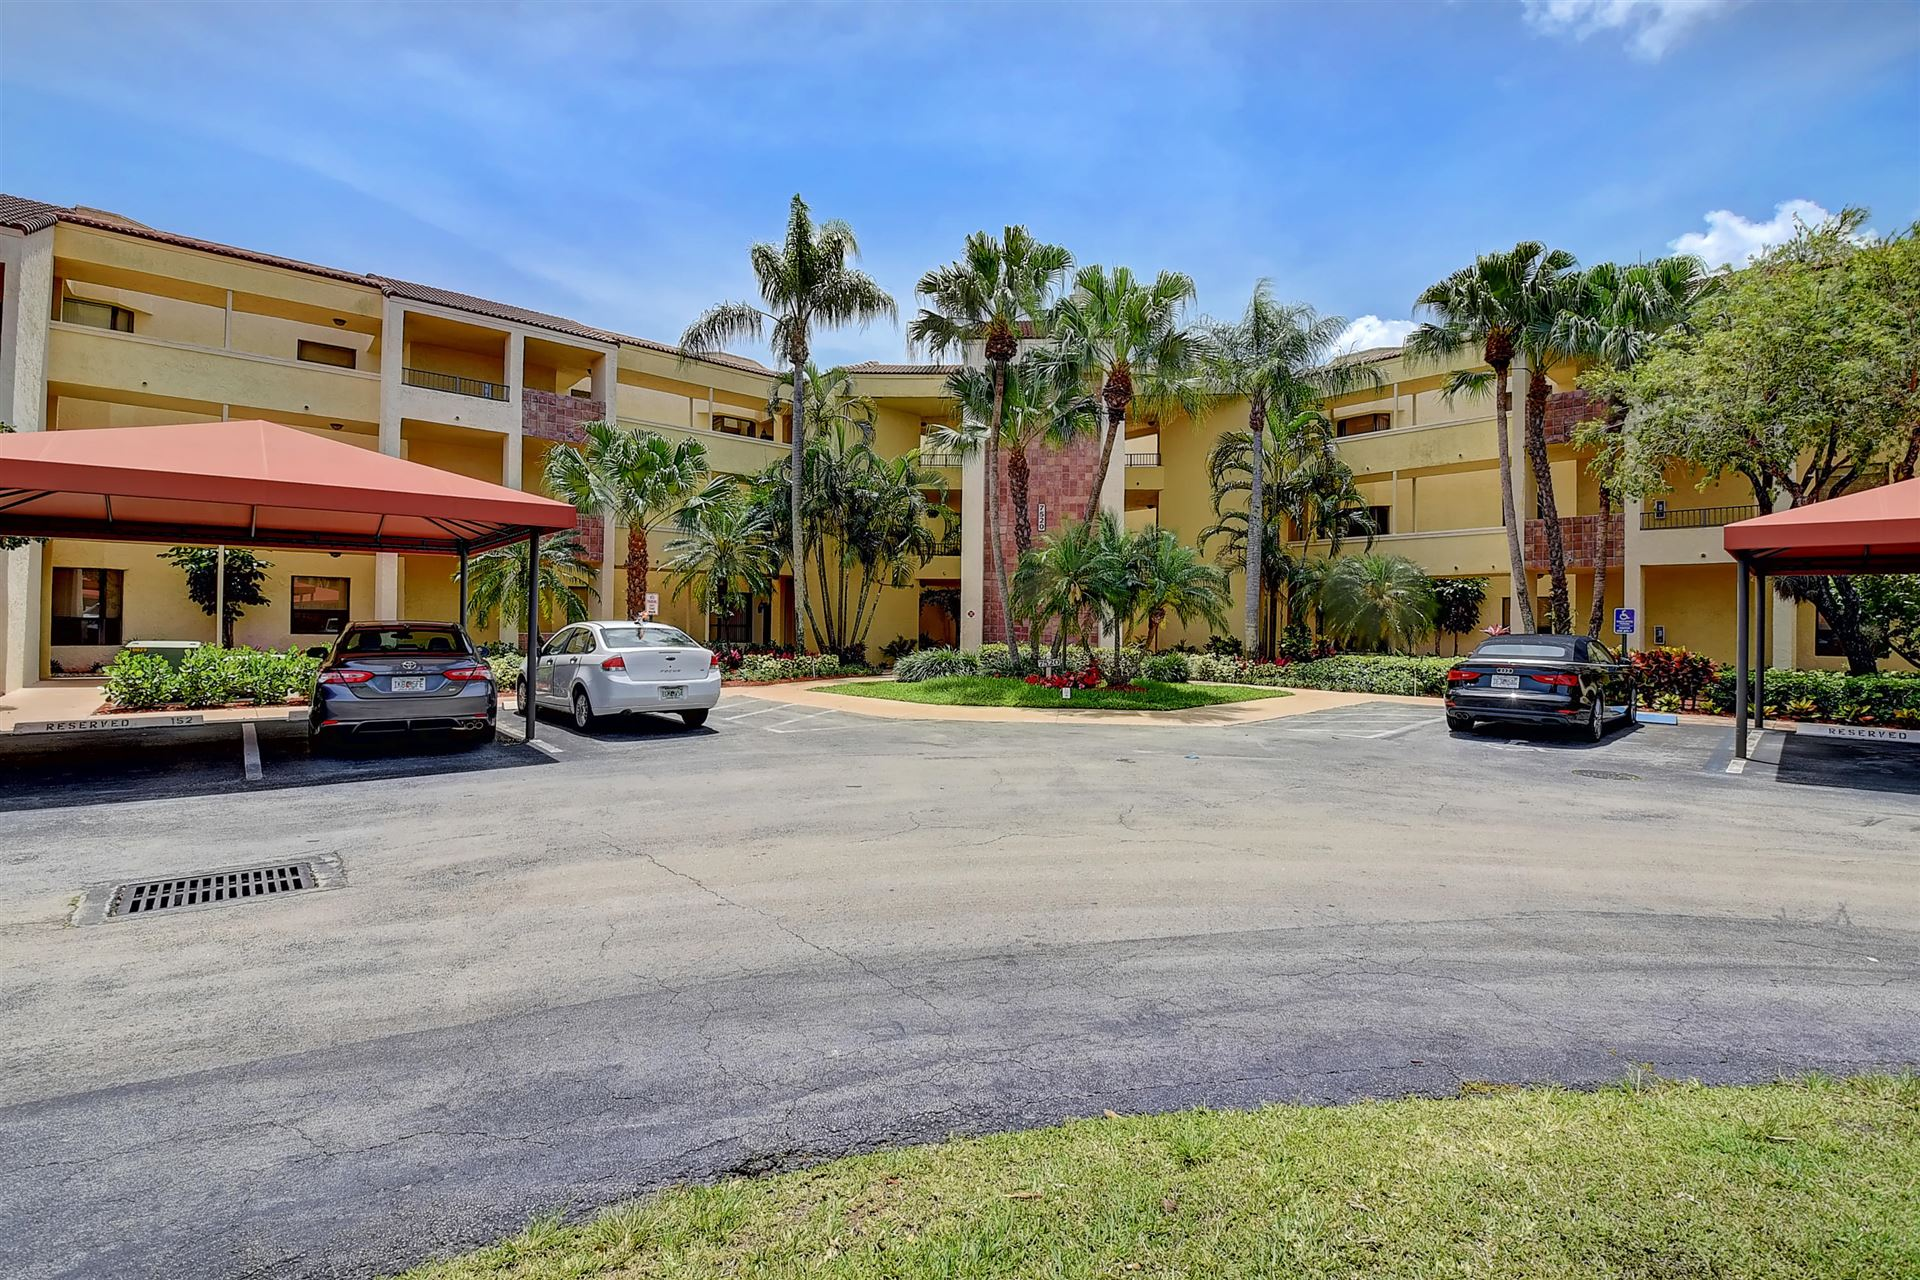 7520 La Paz Boulevard #301, Boca Raton, FL 33433 - MLS#: RX-10711481